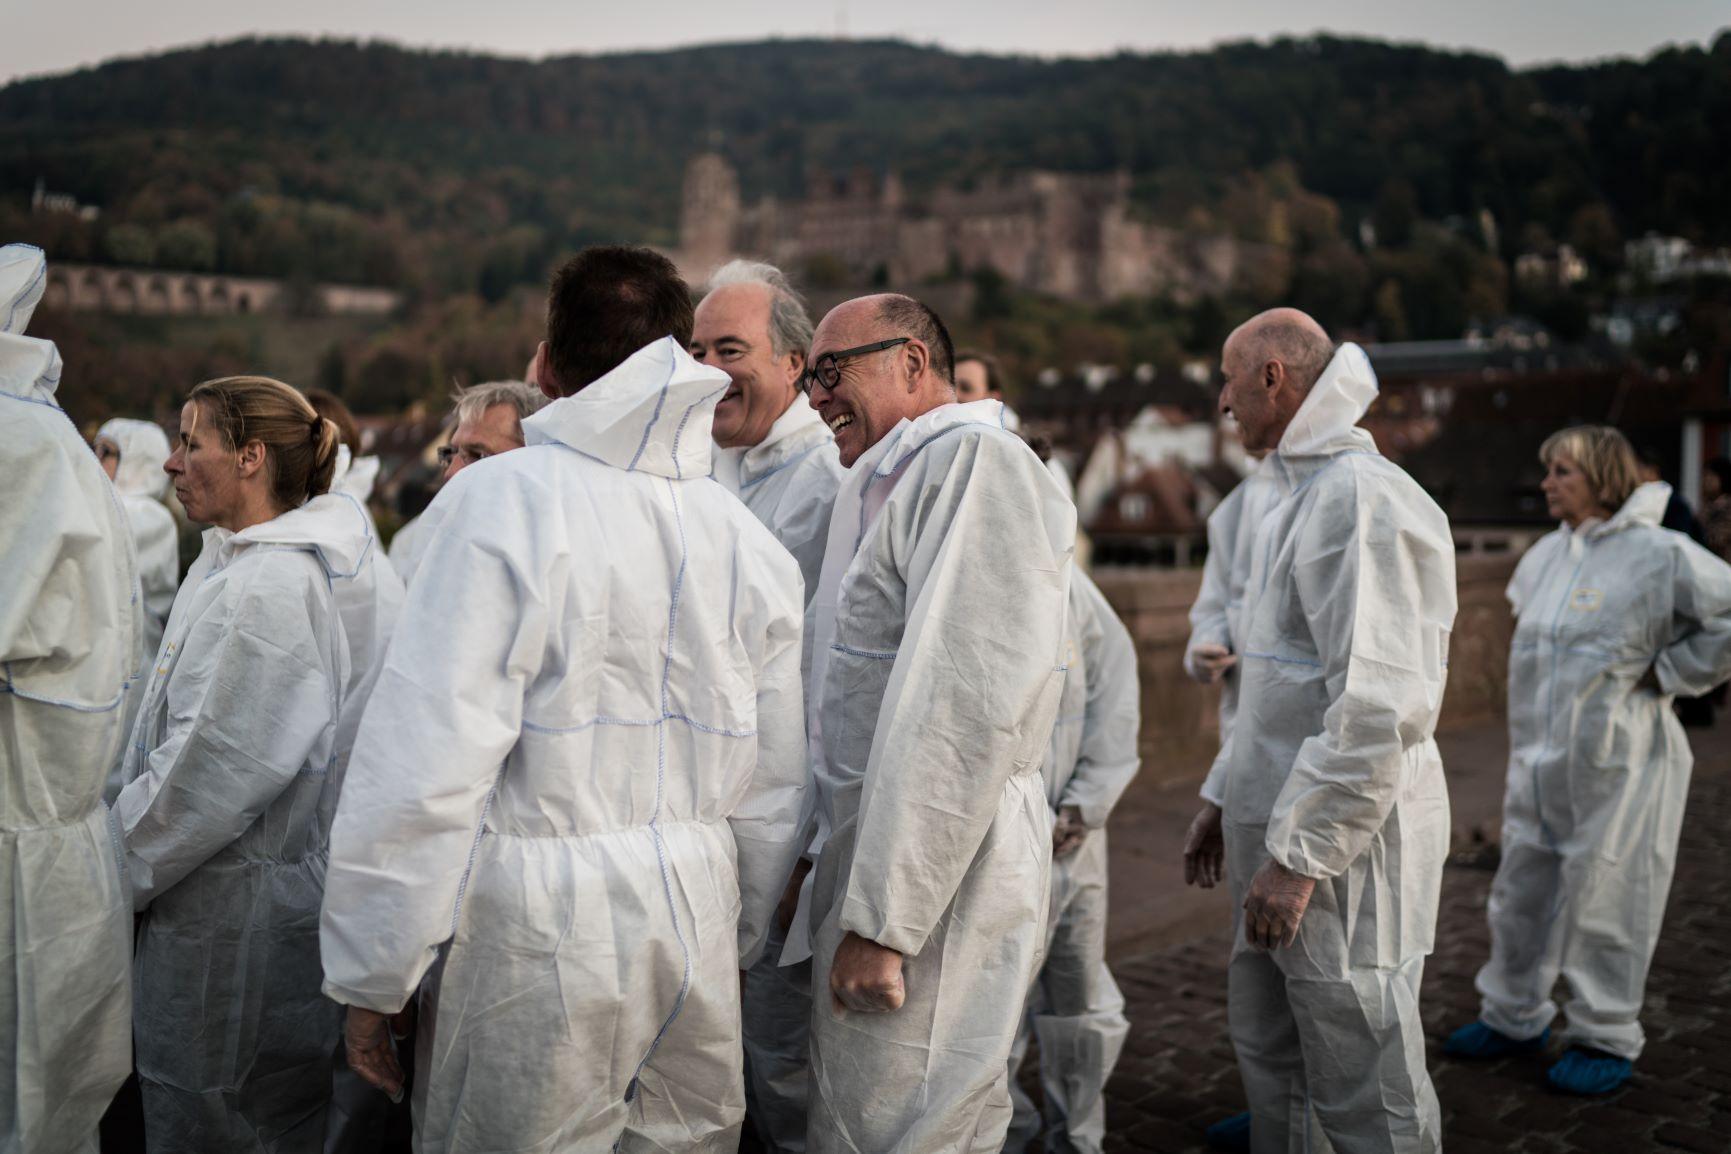 2018-10-SERVANT-LEADERSHIP-Kongress-Fotografie_TINBIRD-FILM-BUREAU-Joana-Kauer-3058.jpg